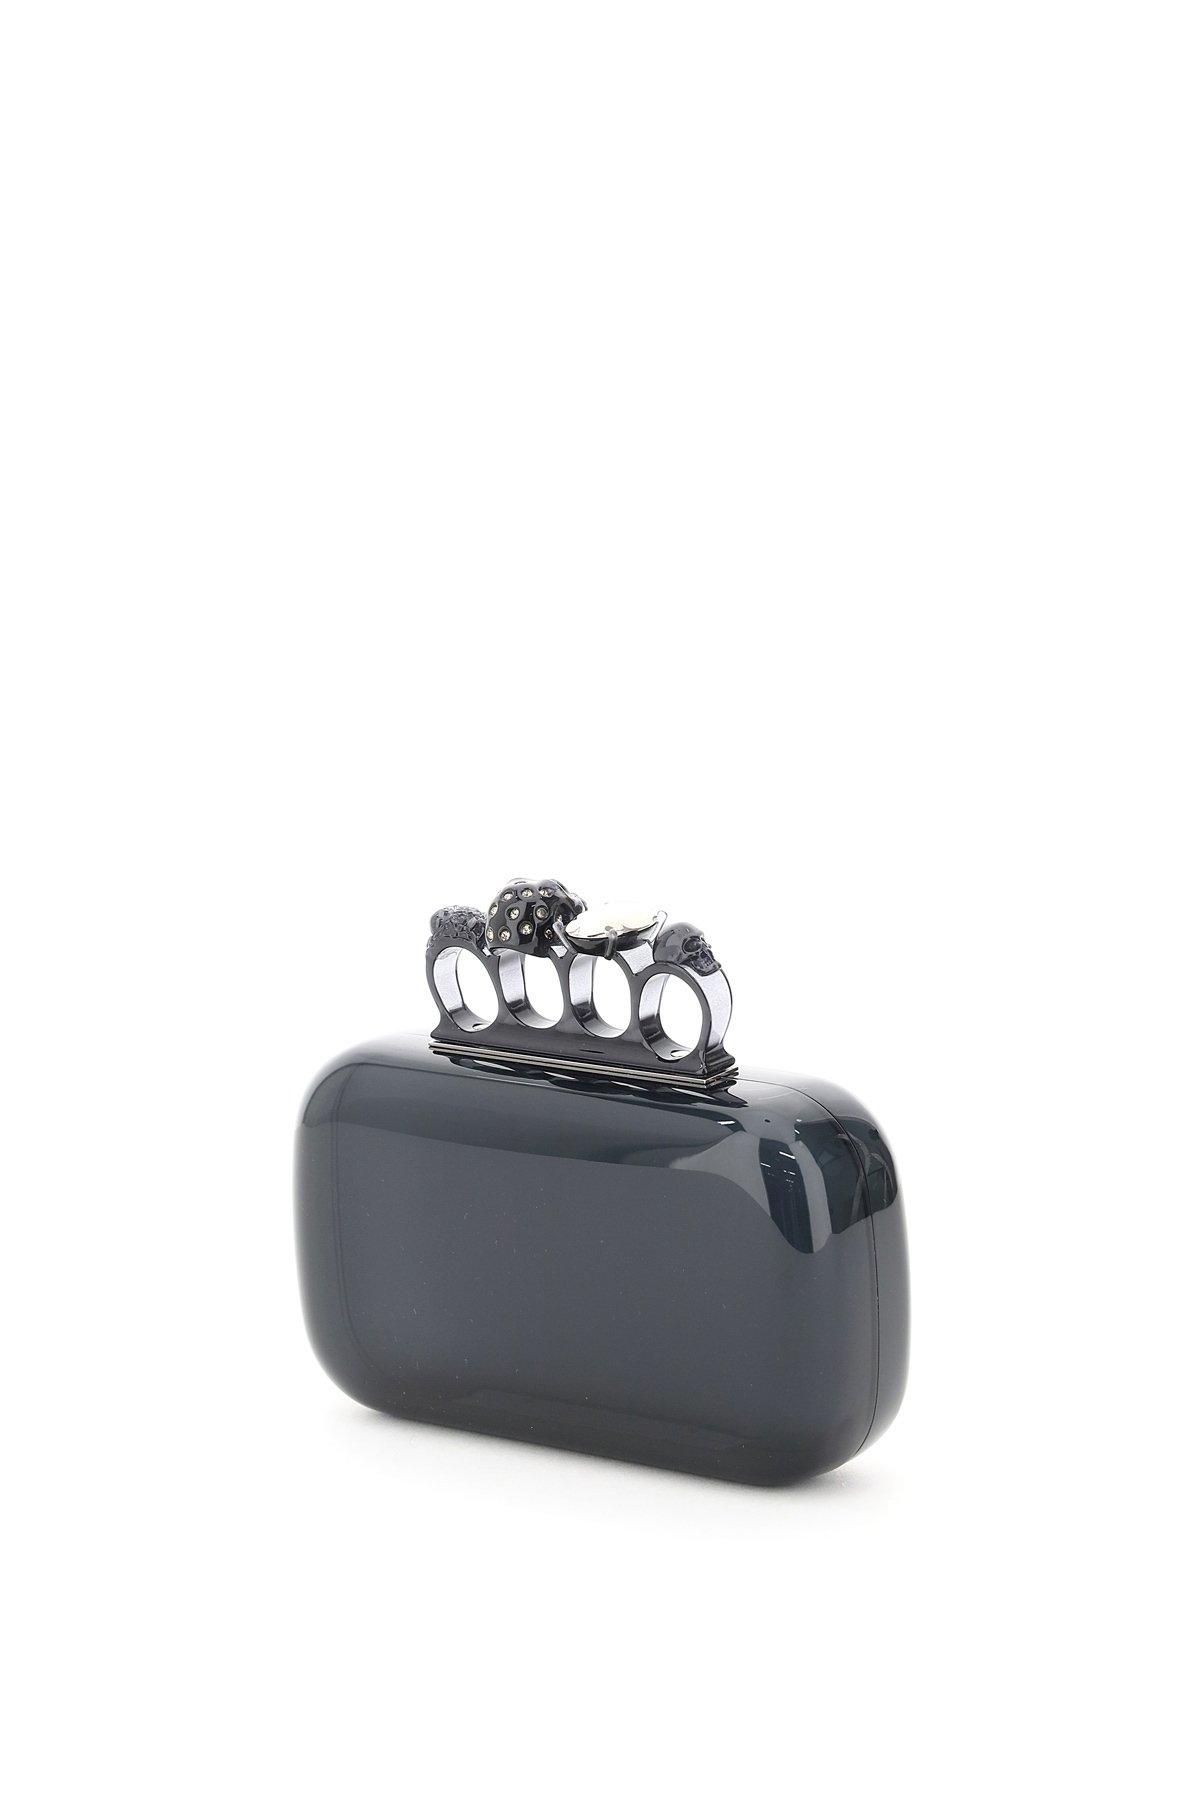 Alexander mcqueen skull four ring clutch bag